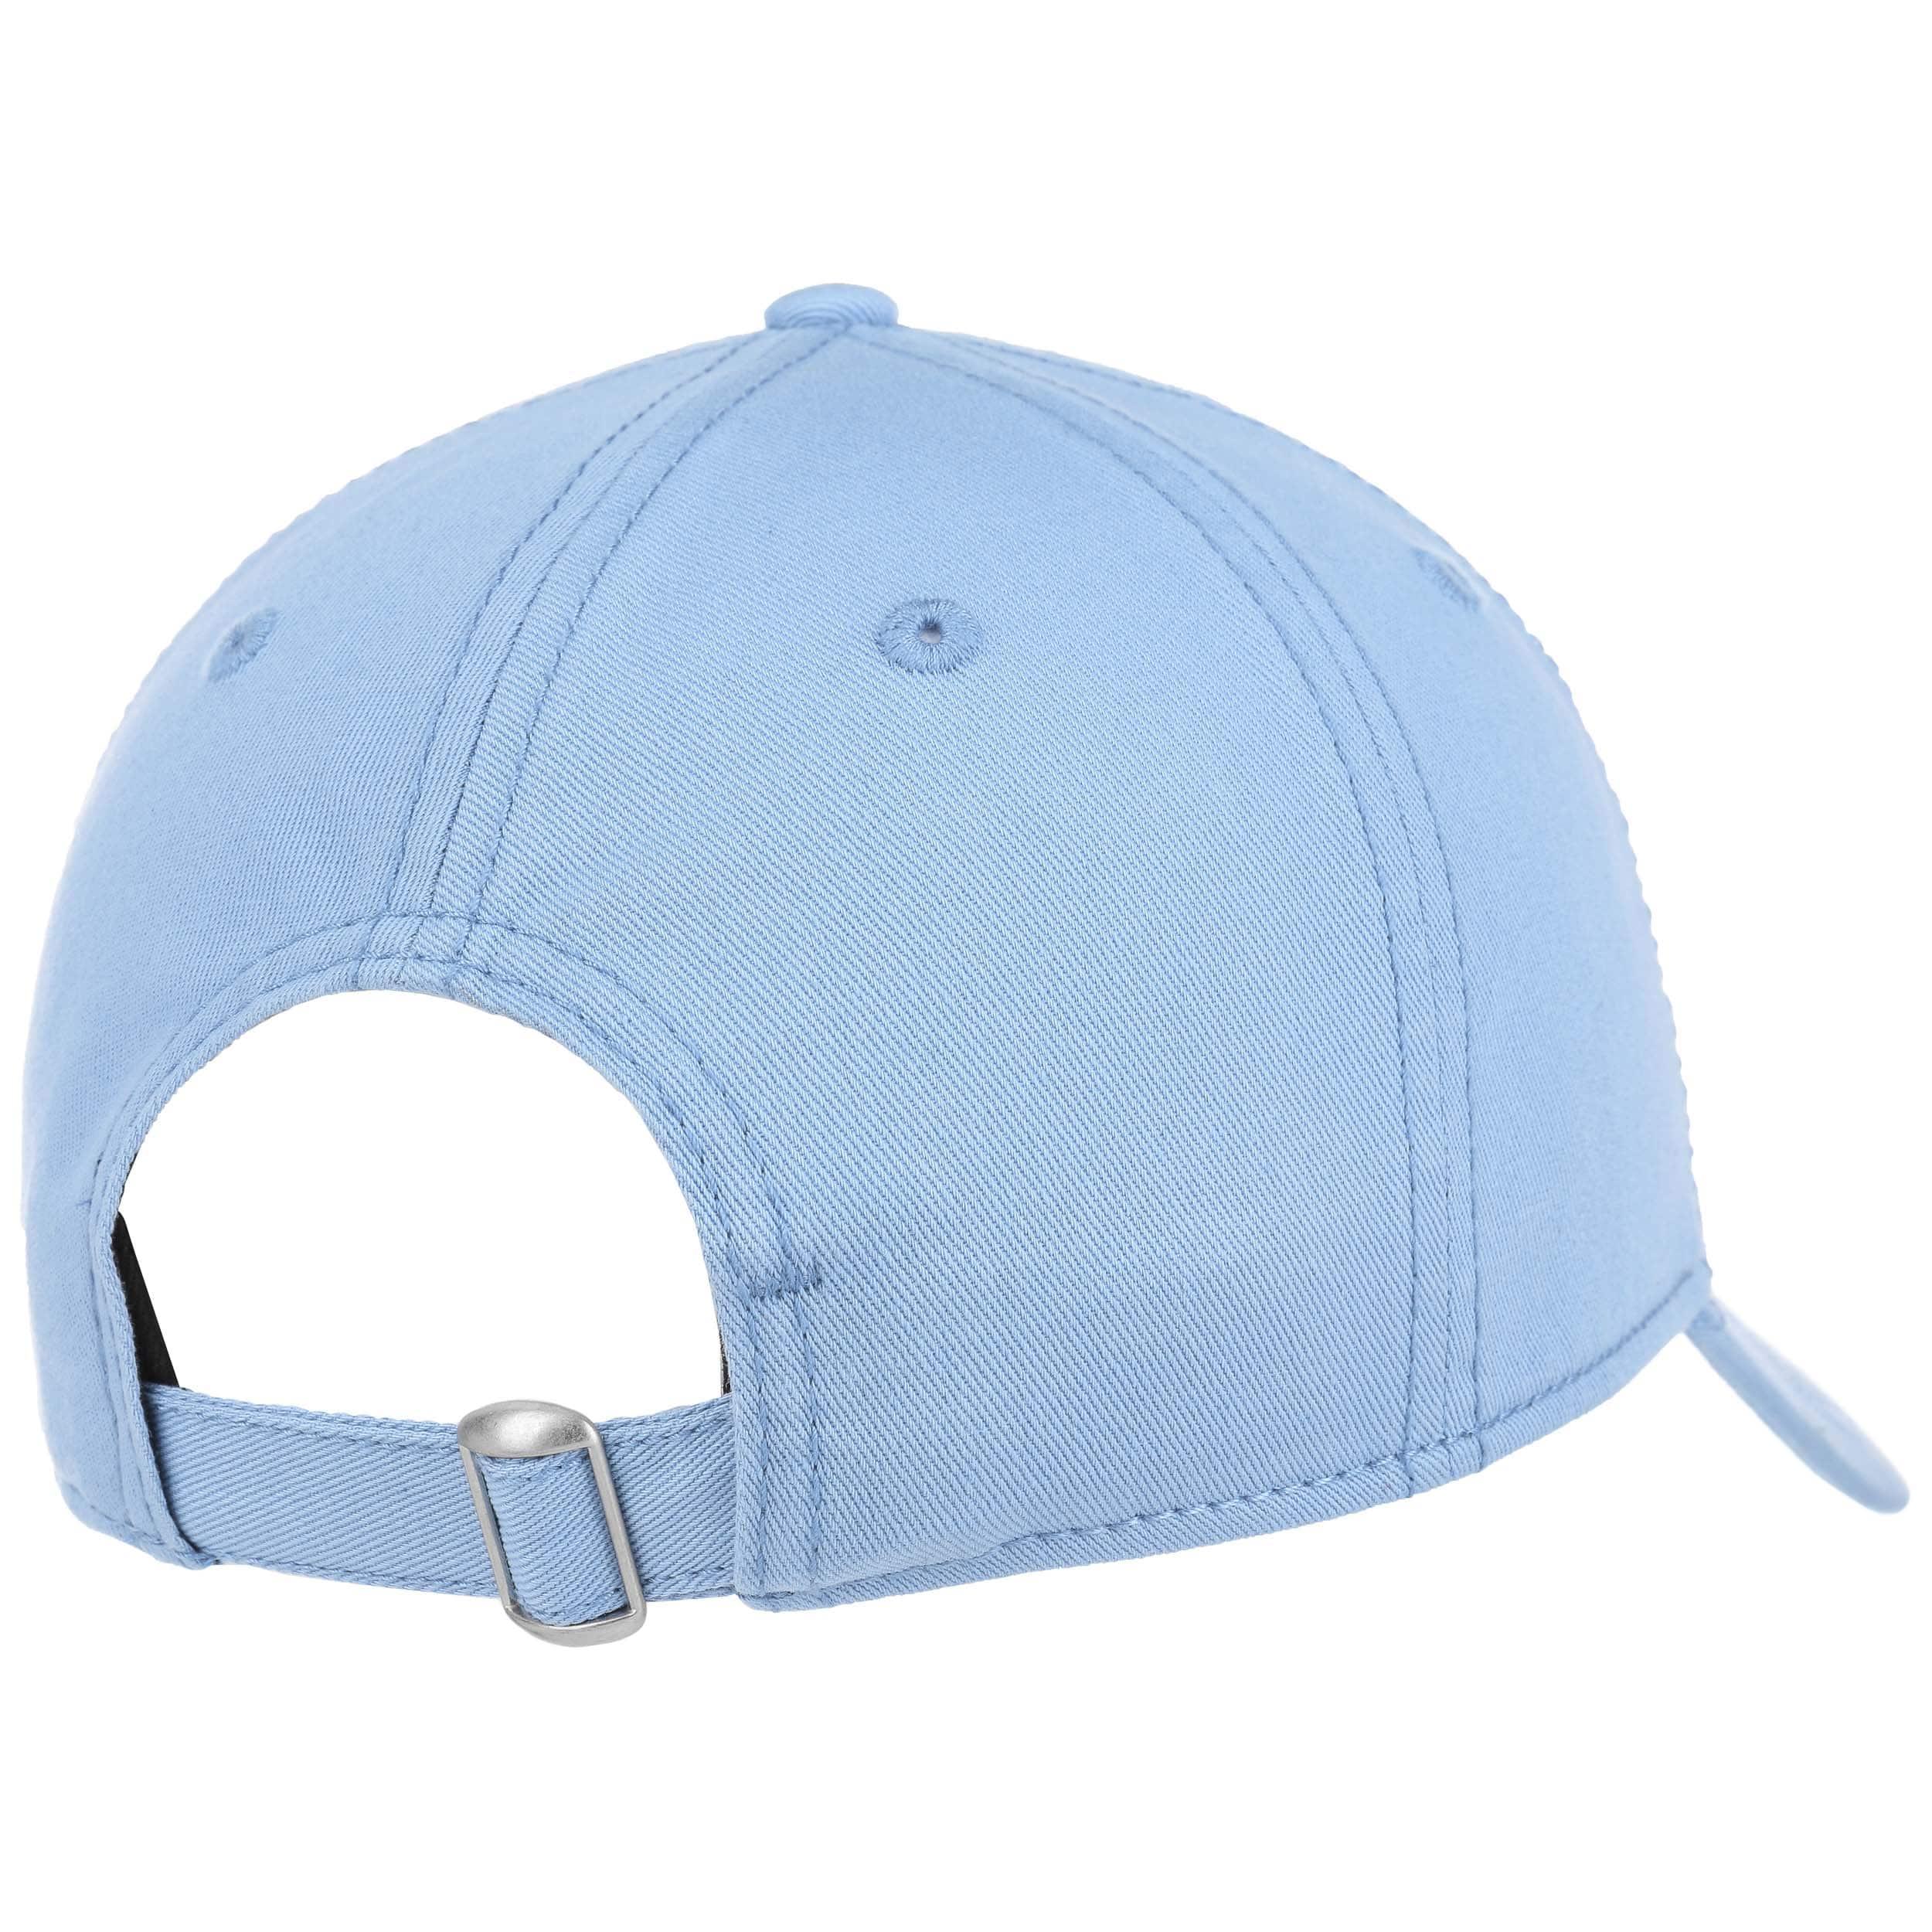 c4dc7cbf097 ... 9Twenty NY Yankees Pastel Cap by New Era - light blue 3 ...